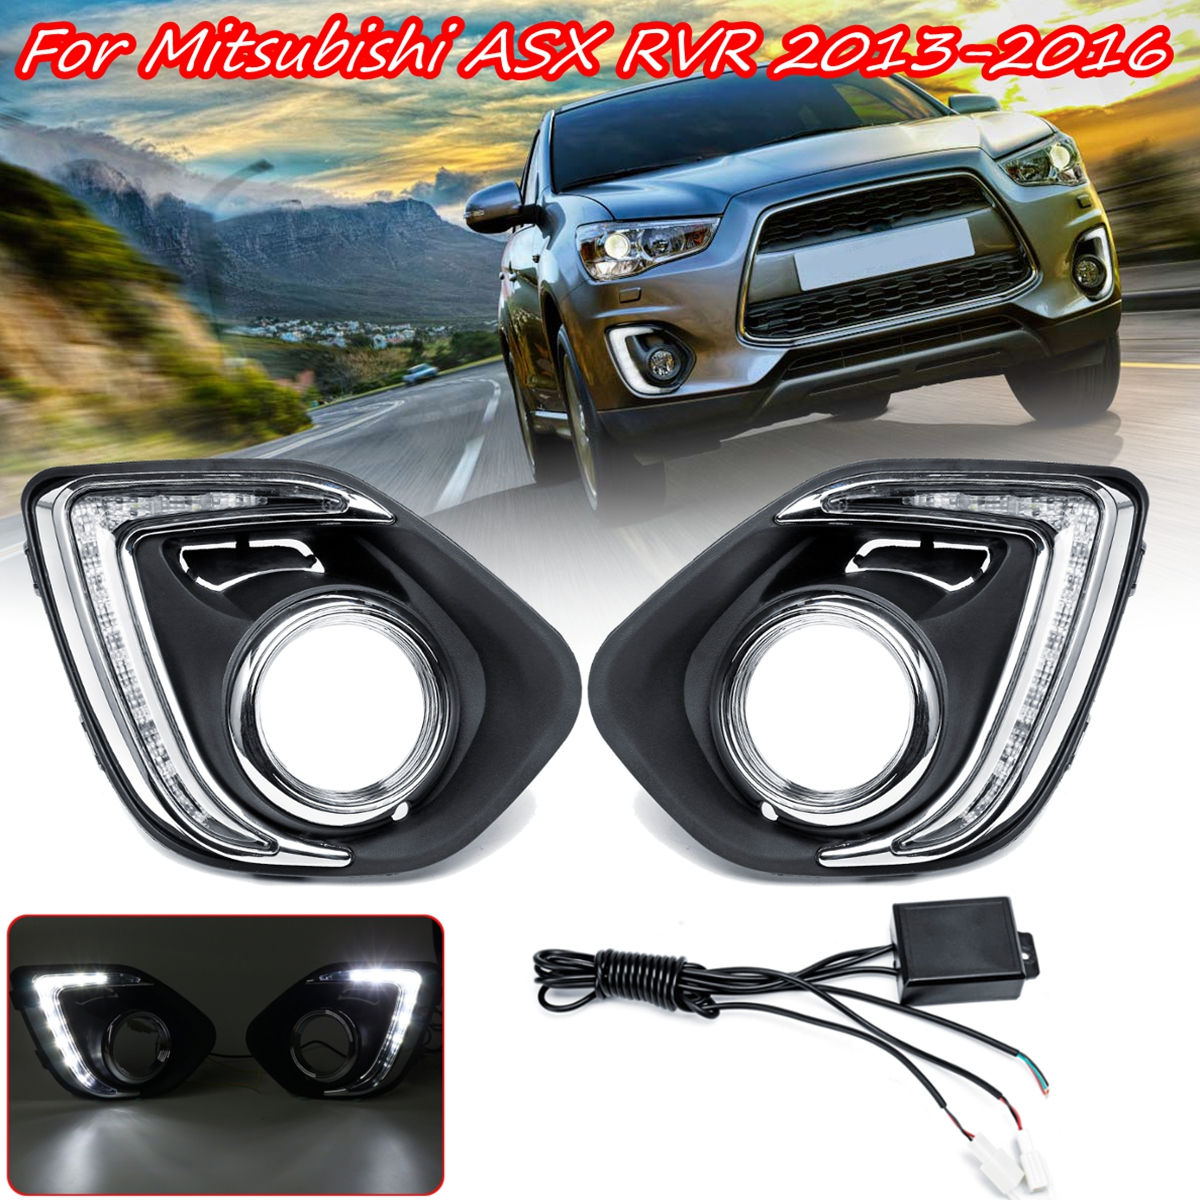 1 Pair LED DRL Daytime Daylight Running Lights 12v warning lamp car Styling lights for Mitsubishi ASX Outlander Sport 2013 2015